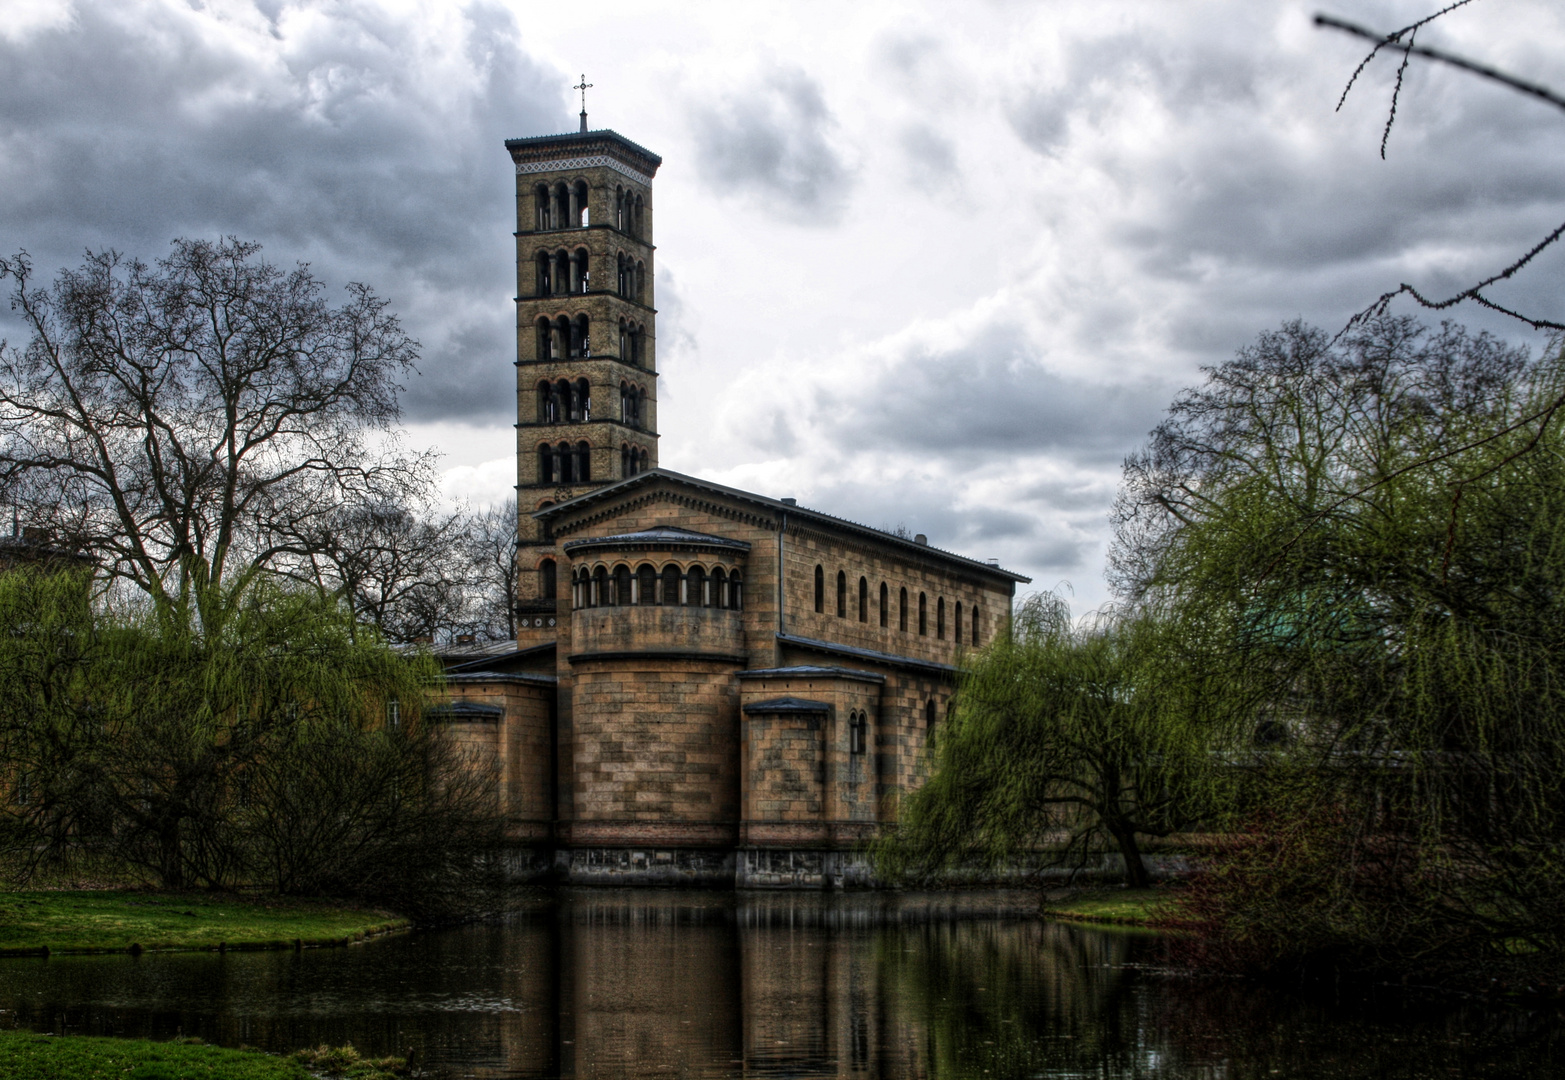 Friedenskirche in Potsdam